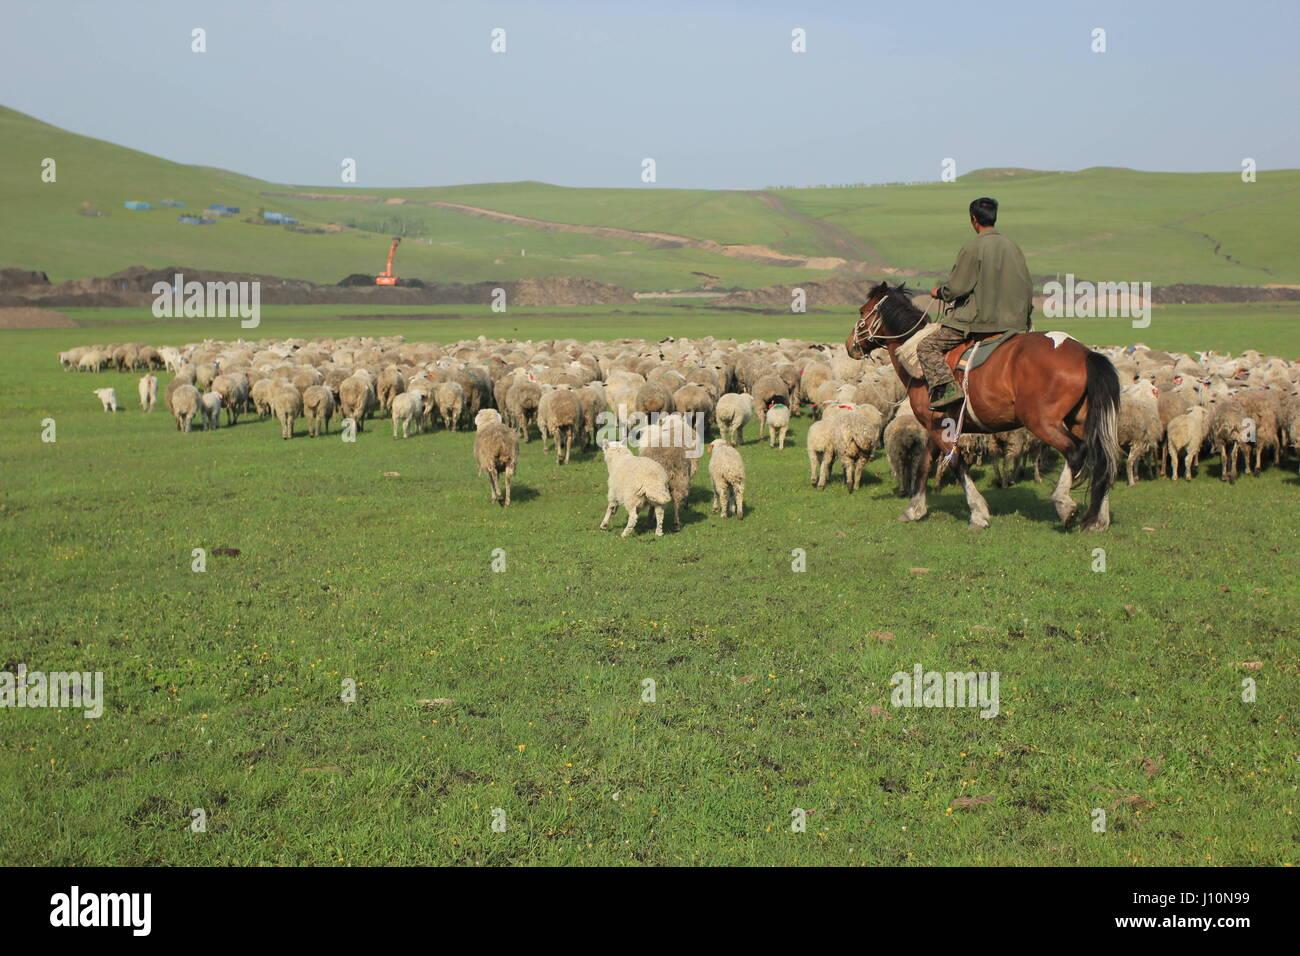 Hulunbuir China 18th Apr 2017 A Herdsman In North Chinas Inner Mongolia Autonomous Region Credit SIPA Asia ZUMA Wire Alamy Live News